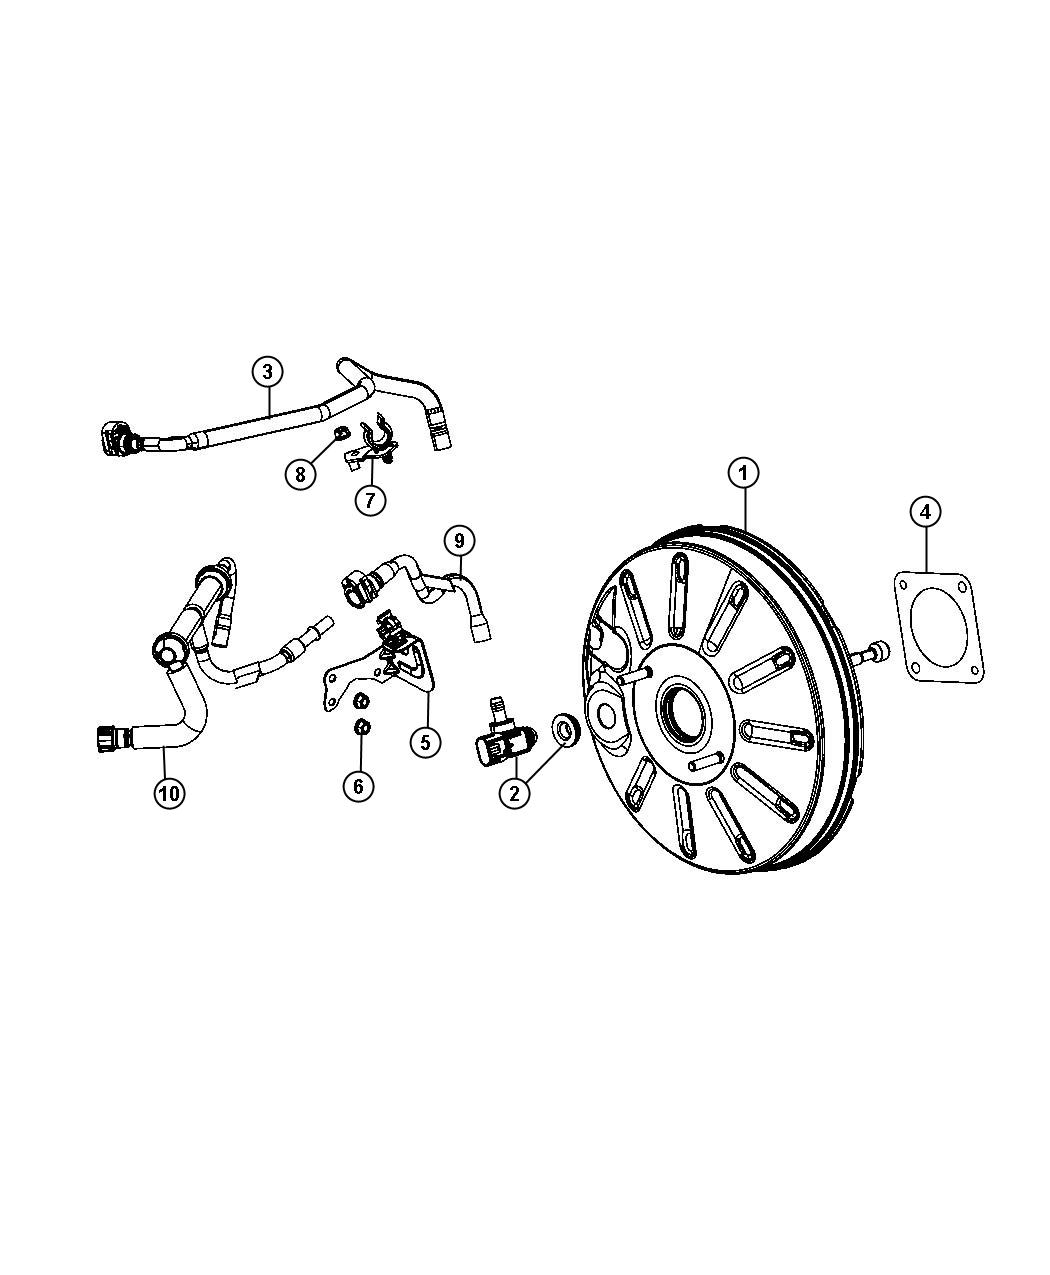 2013 Dodge Dart Hose. Brake booster vacuum. Engine, power